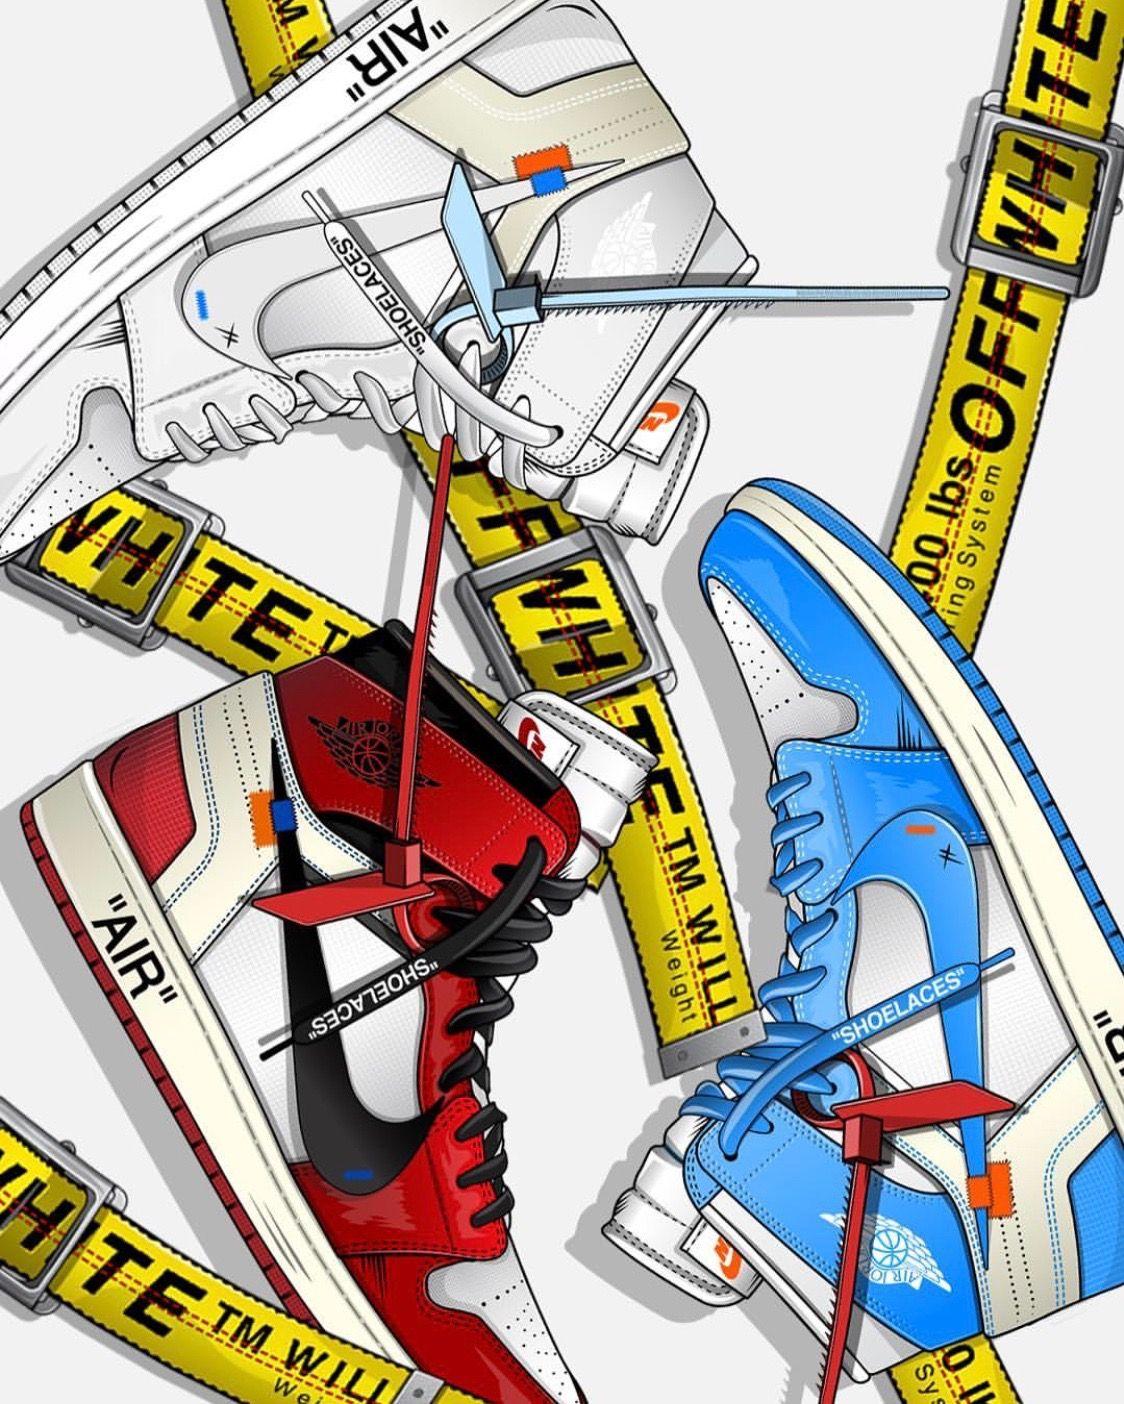 Off White Jordans Sneakers Wallpaper Shoes Wallpaper Nike Wallpaper